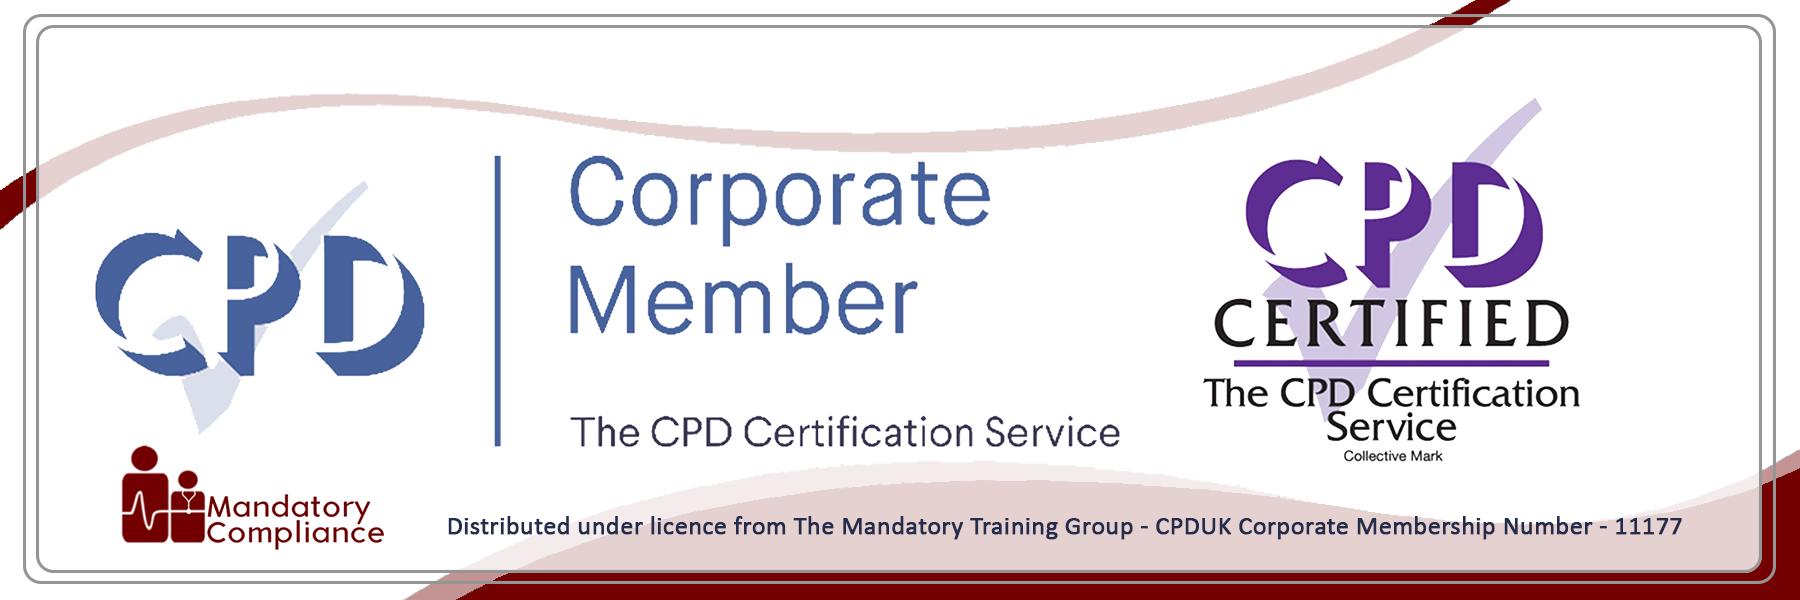 Mastering MS Word 2016 -Online Training Course - The Mandatory Training Group UK -